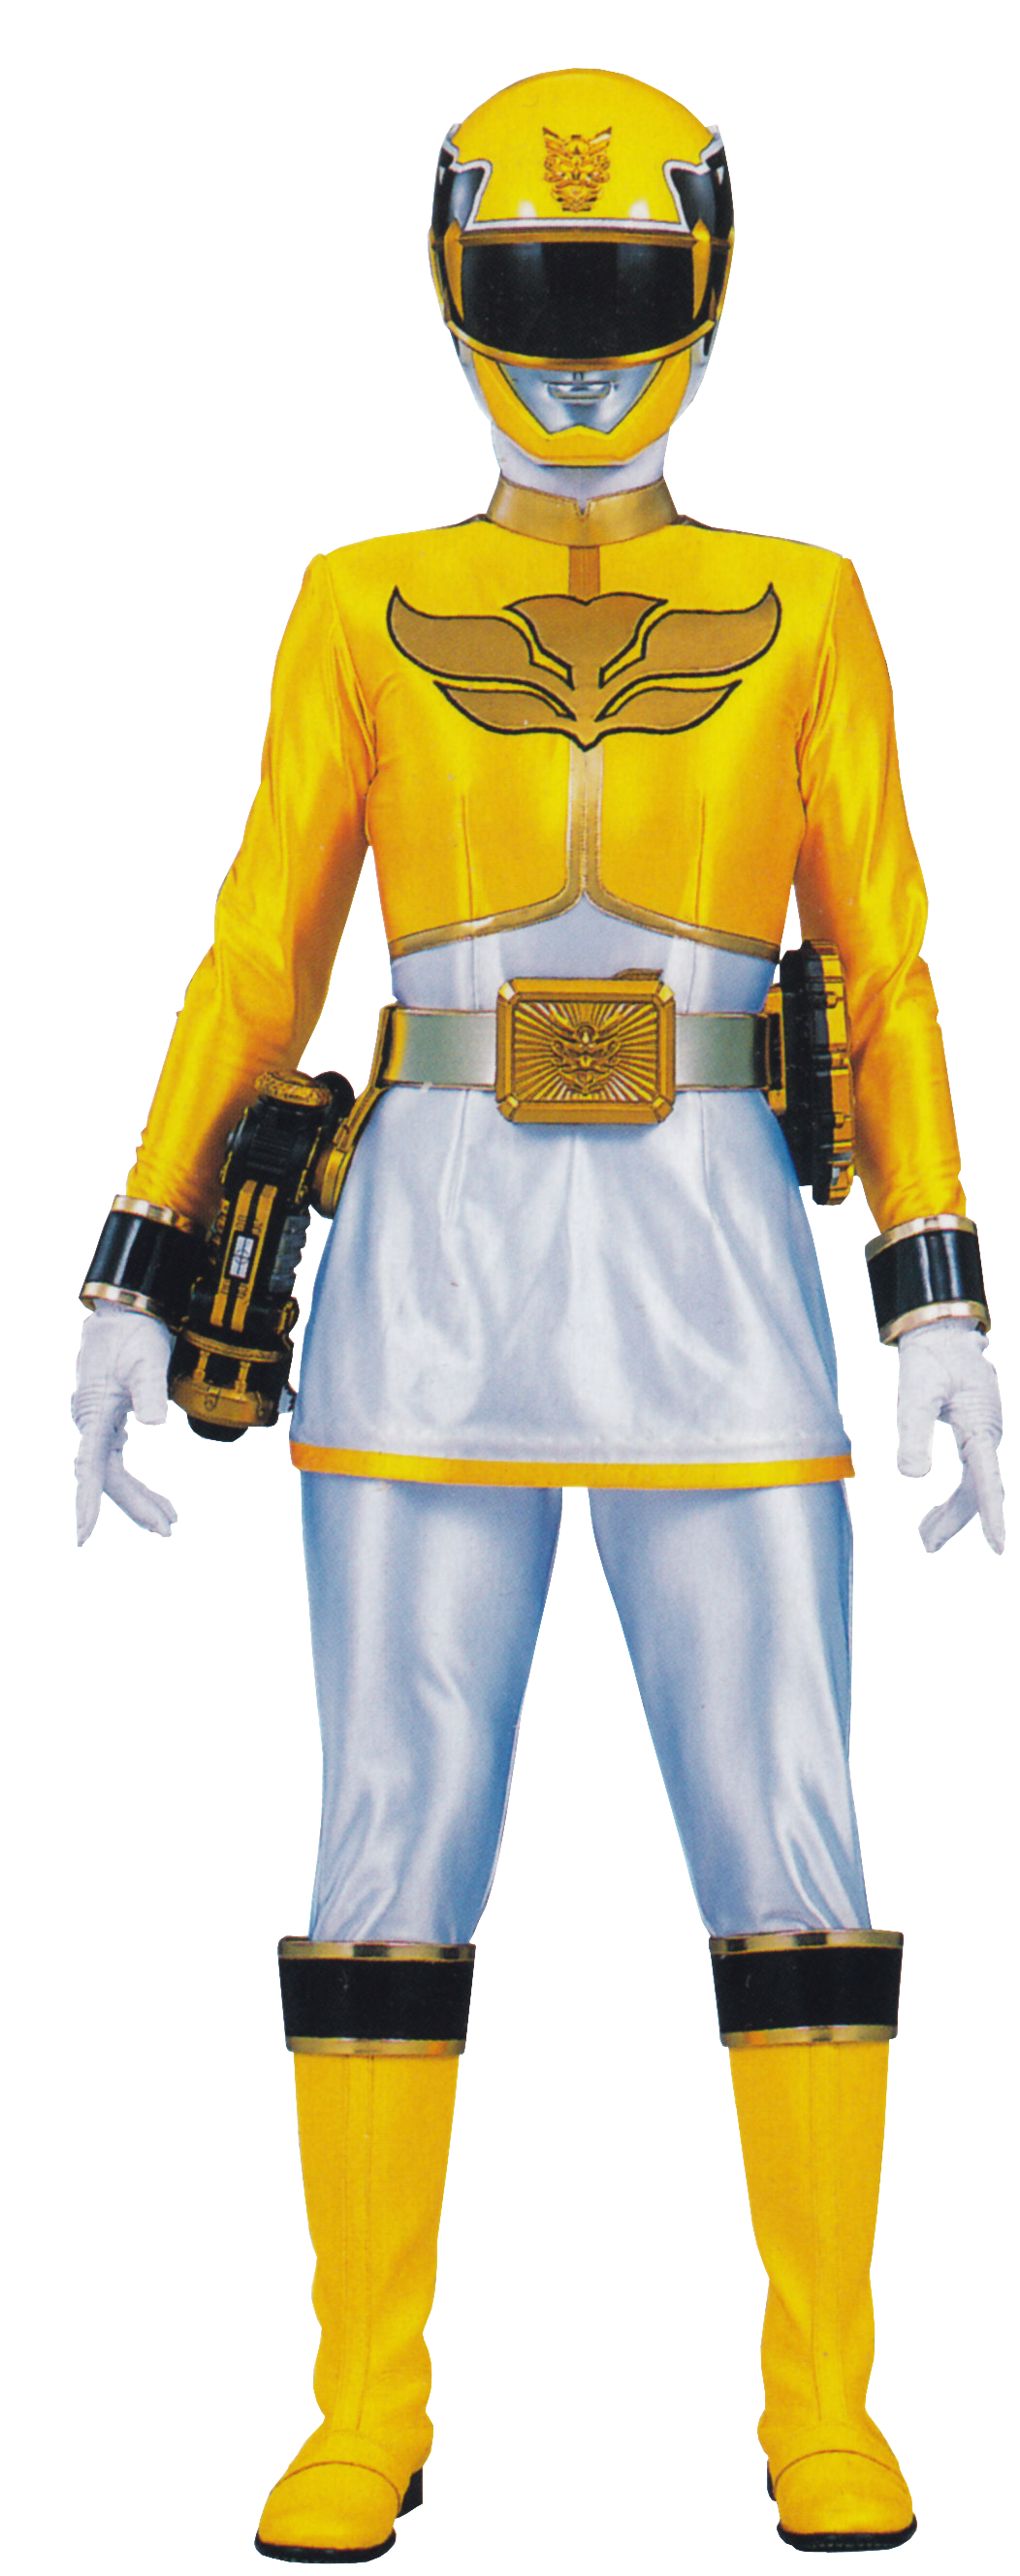 Power Rangers Mega Force Yellow Ranger Google Search Power Rangers Megaforce Power Rangers Super Megaforce Power Rangers